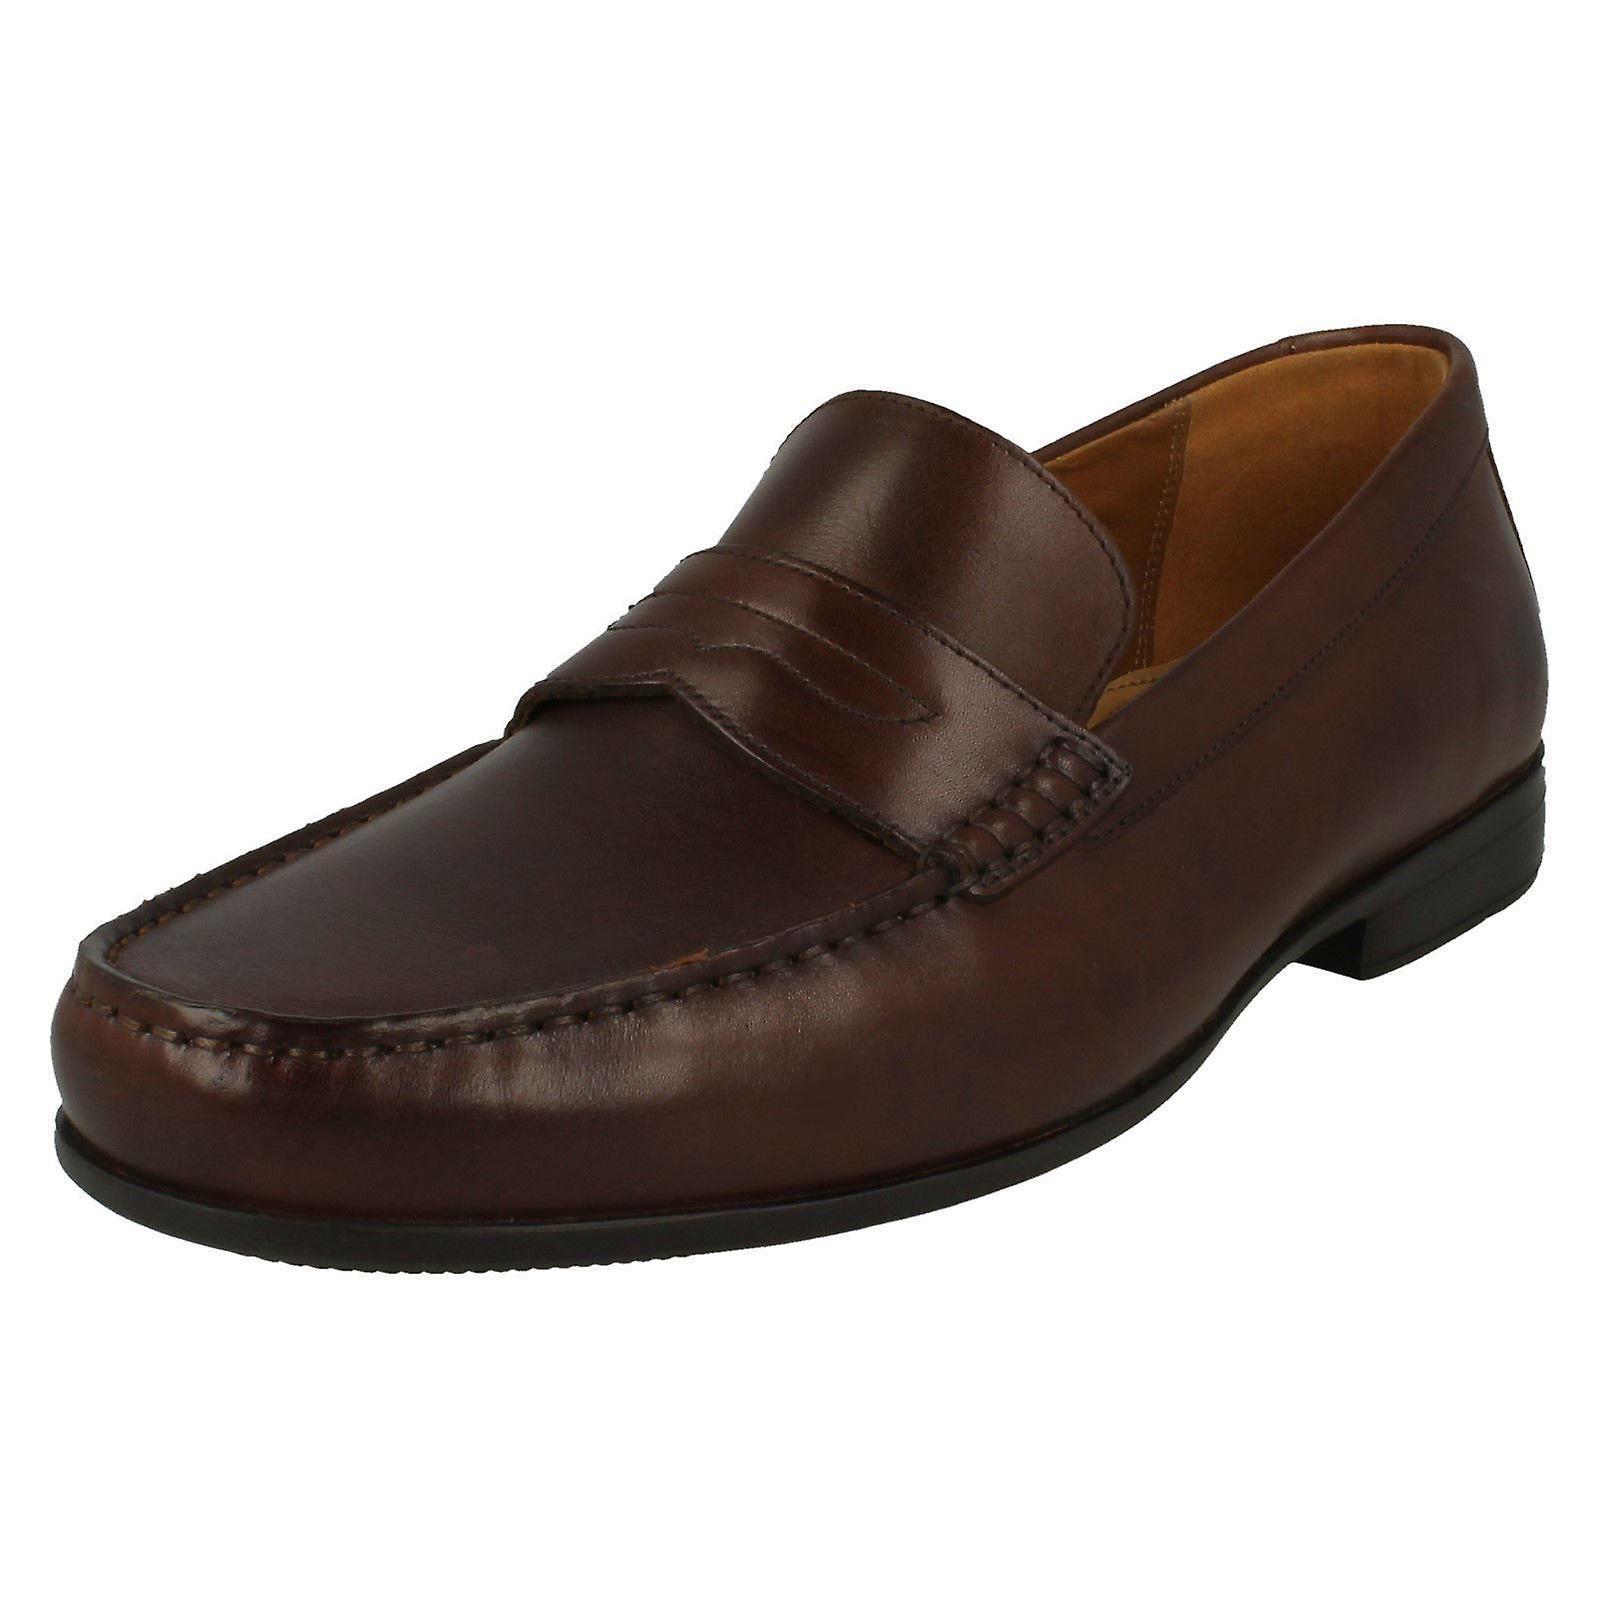 Mens Clarks formelle Slip On chaussures Claude Lane